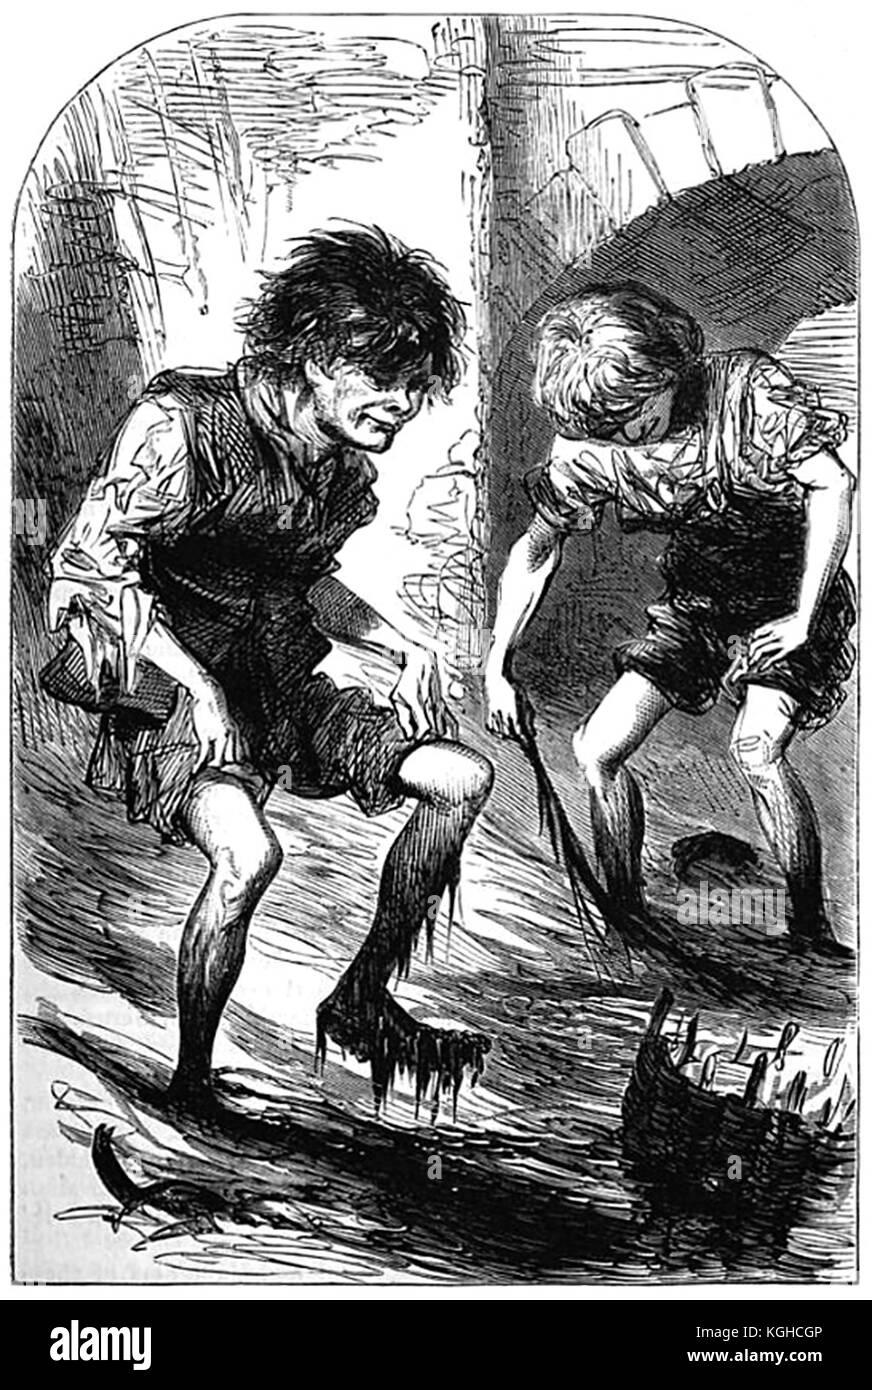 Mudlarks of Victorian London - Stock Image